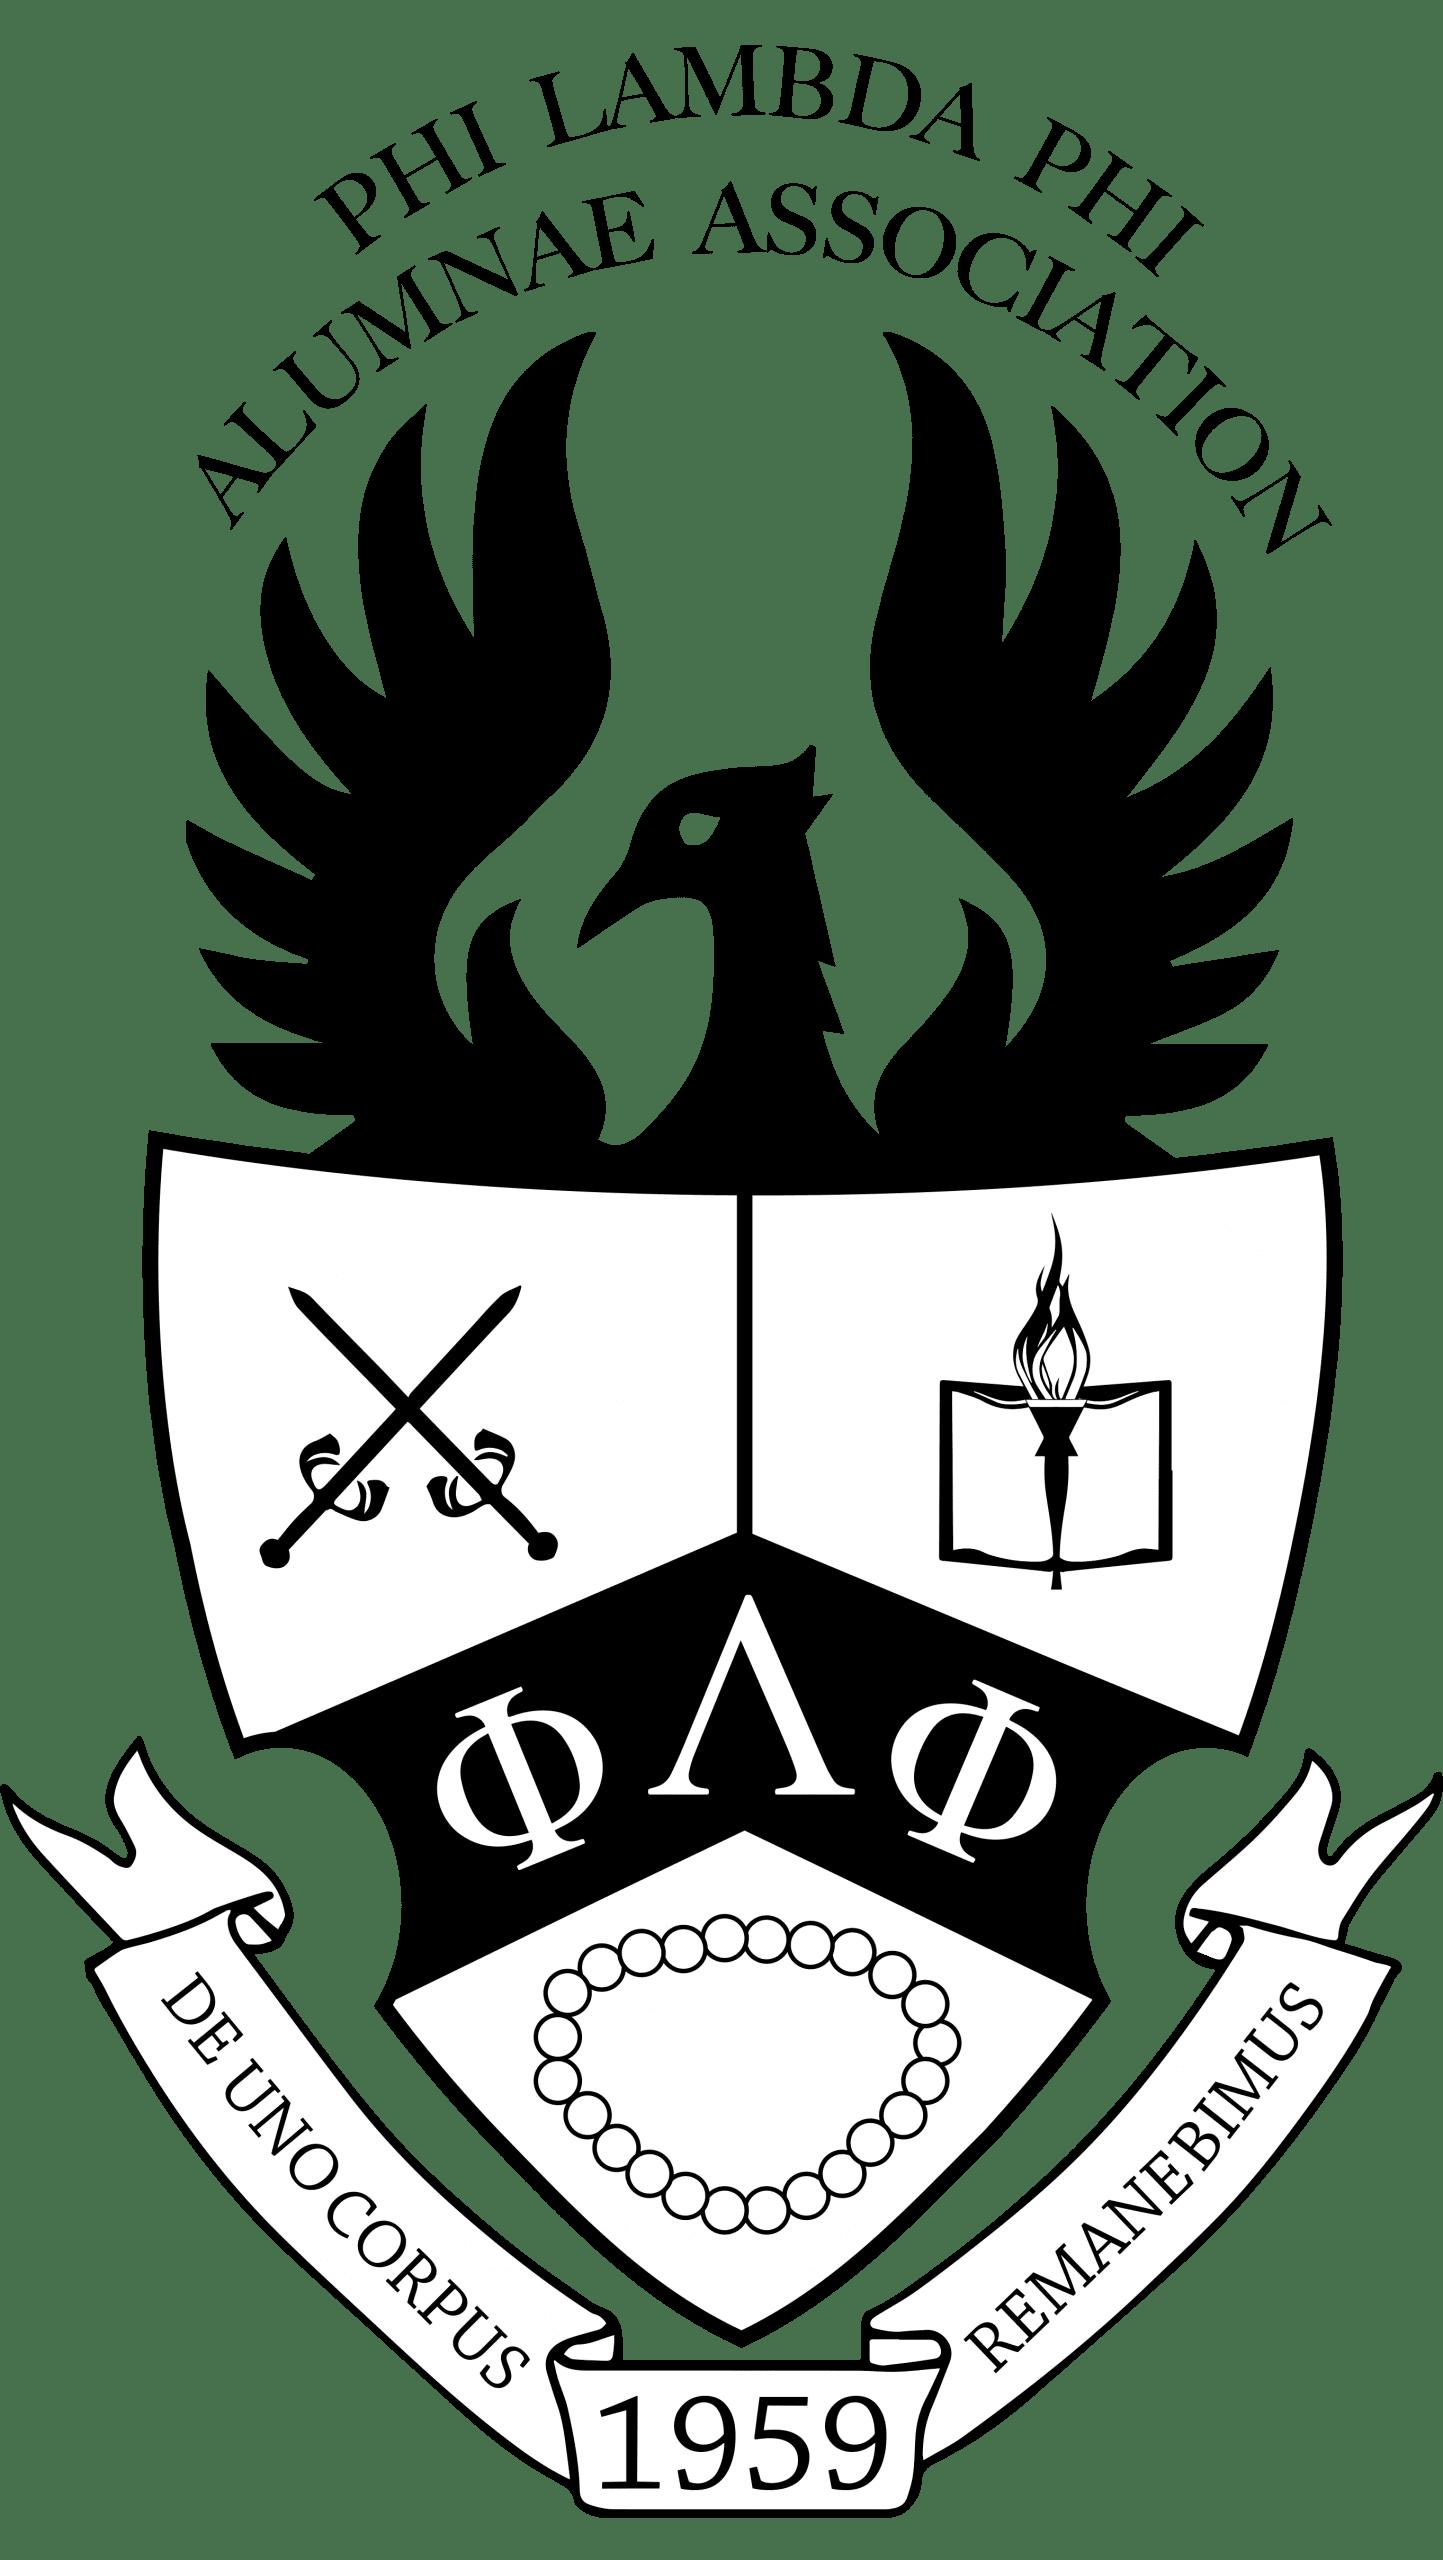 Phi Lambda Phi Alumnae Association